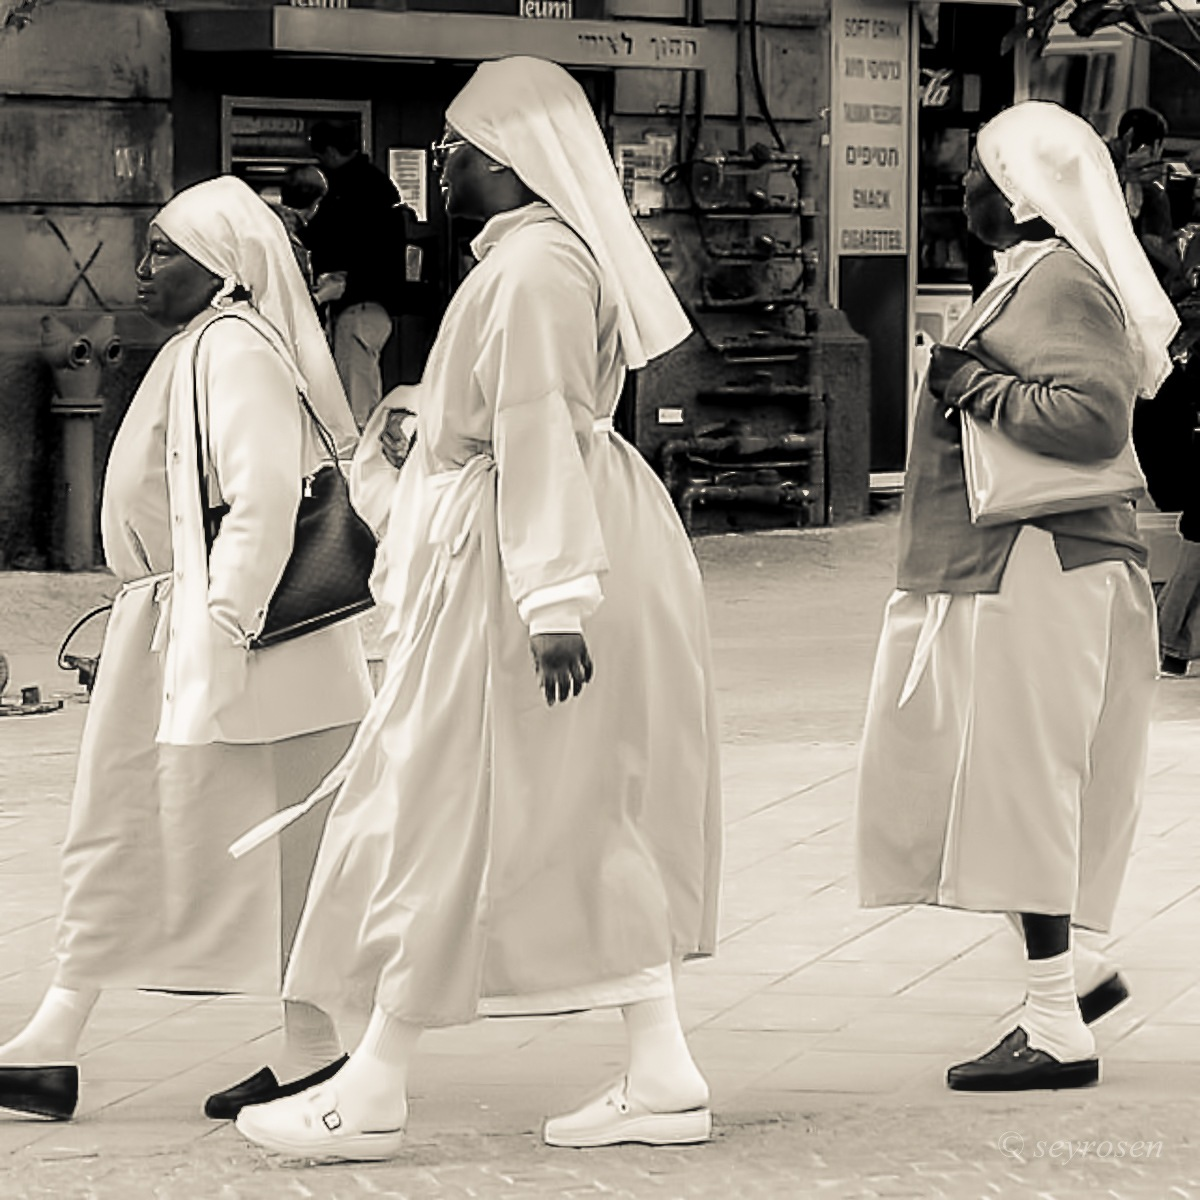 3 graces..... by seyrosen